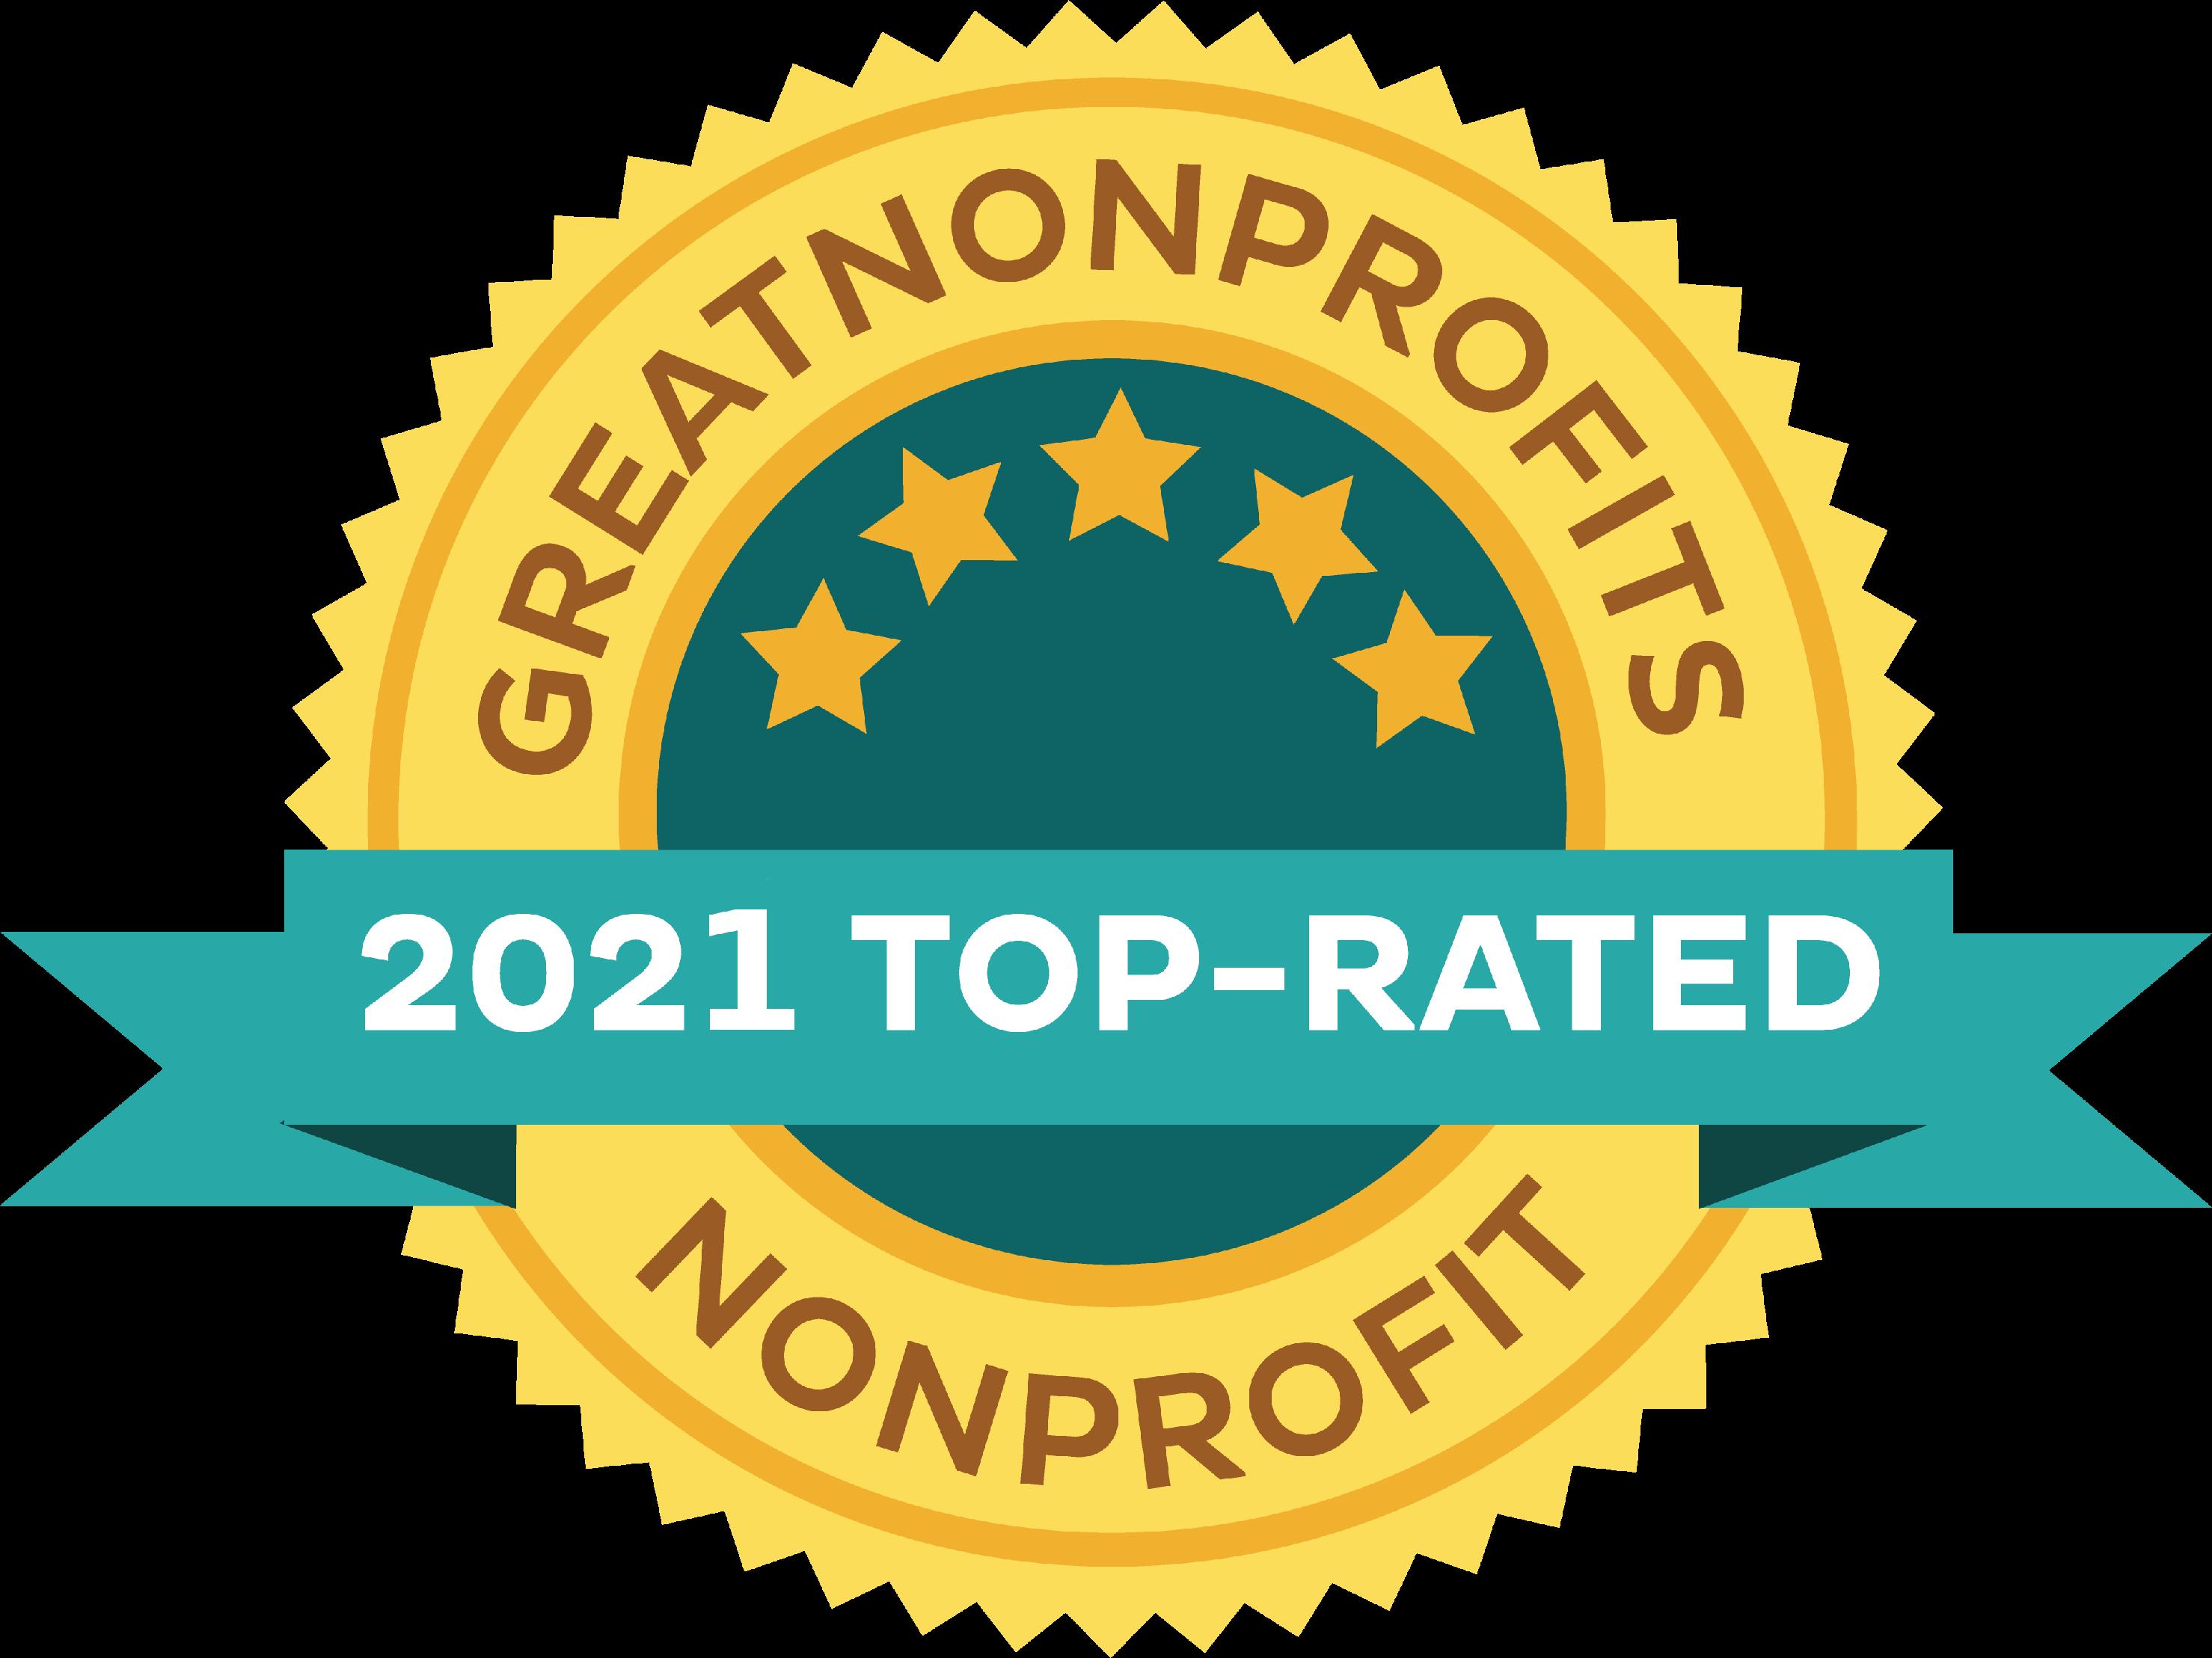 https://greatnonprofits.org/img/2021-top-rated-awards-badge-hi-res.png?utm_source=trigger_email&utm_campaign=top_rated_winner&utm_medium=email